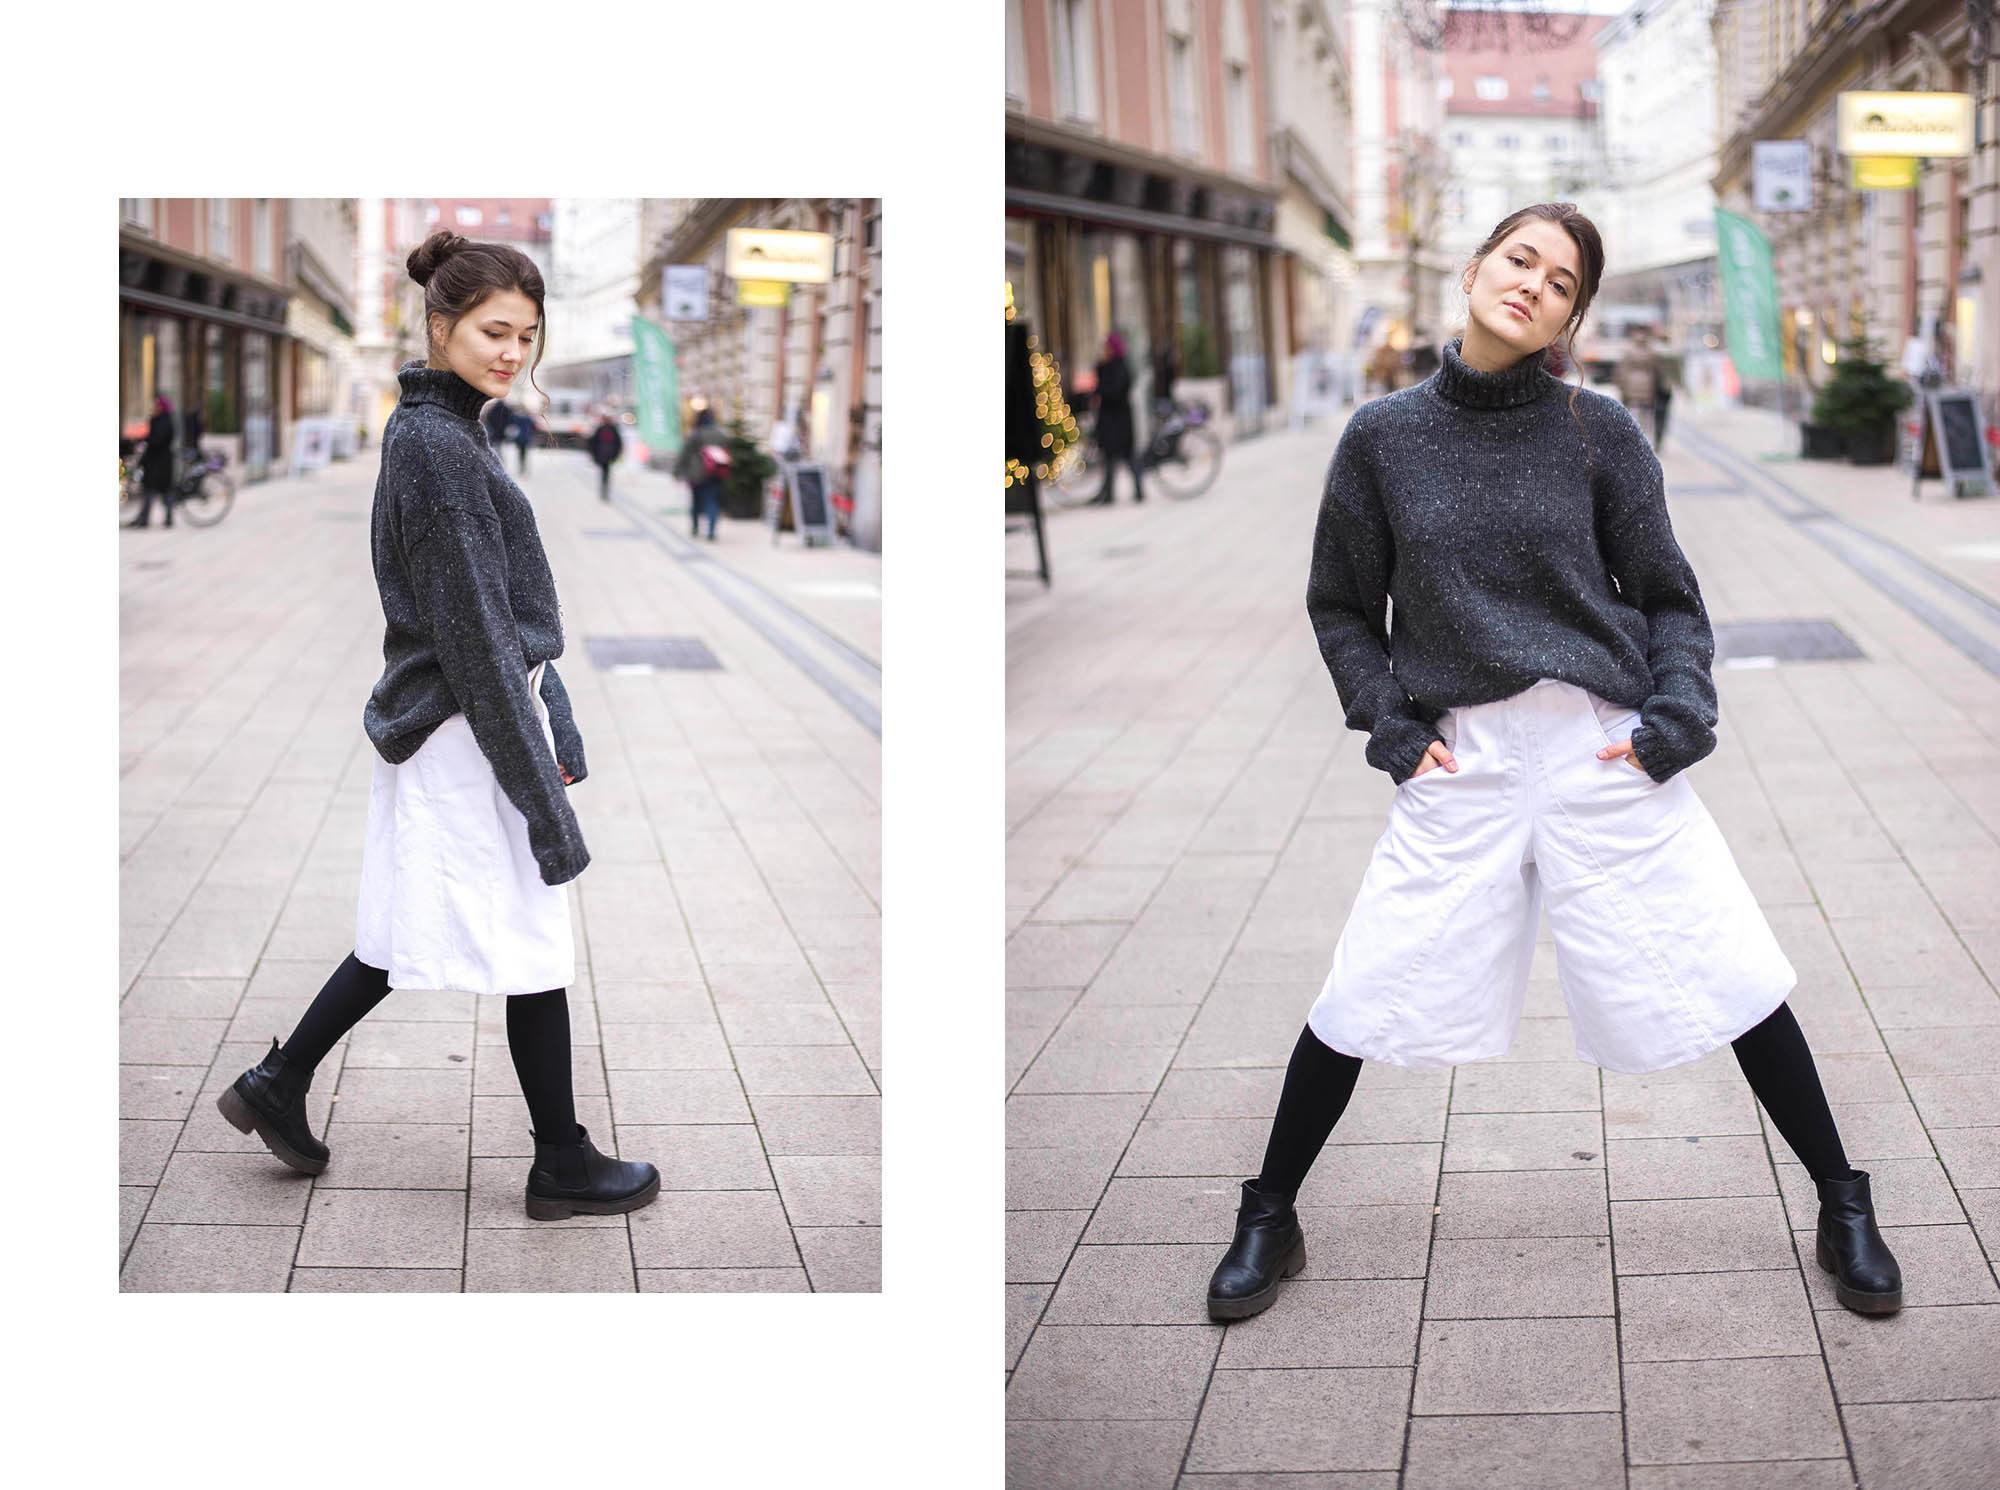 Dogdays of Summer Vintage Outfit Vintage store onlineshop Graz Austria Österreich Diana Ranegger Modeschule Graz